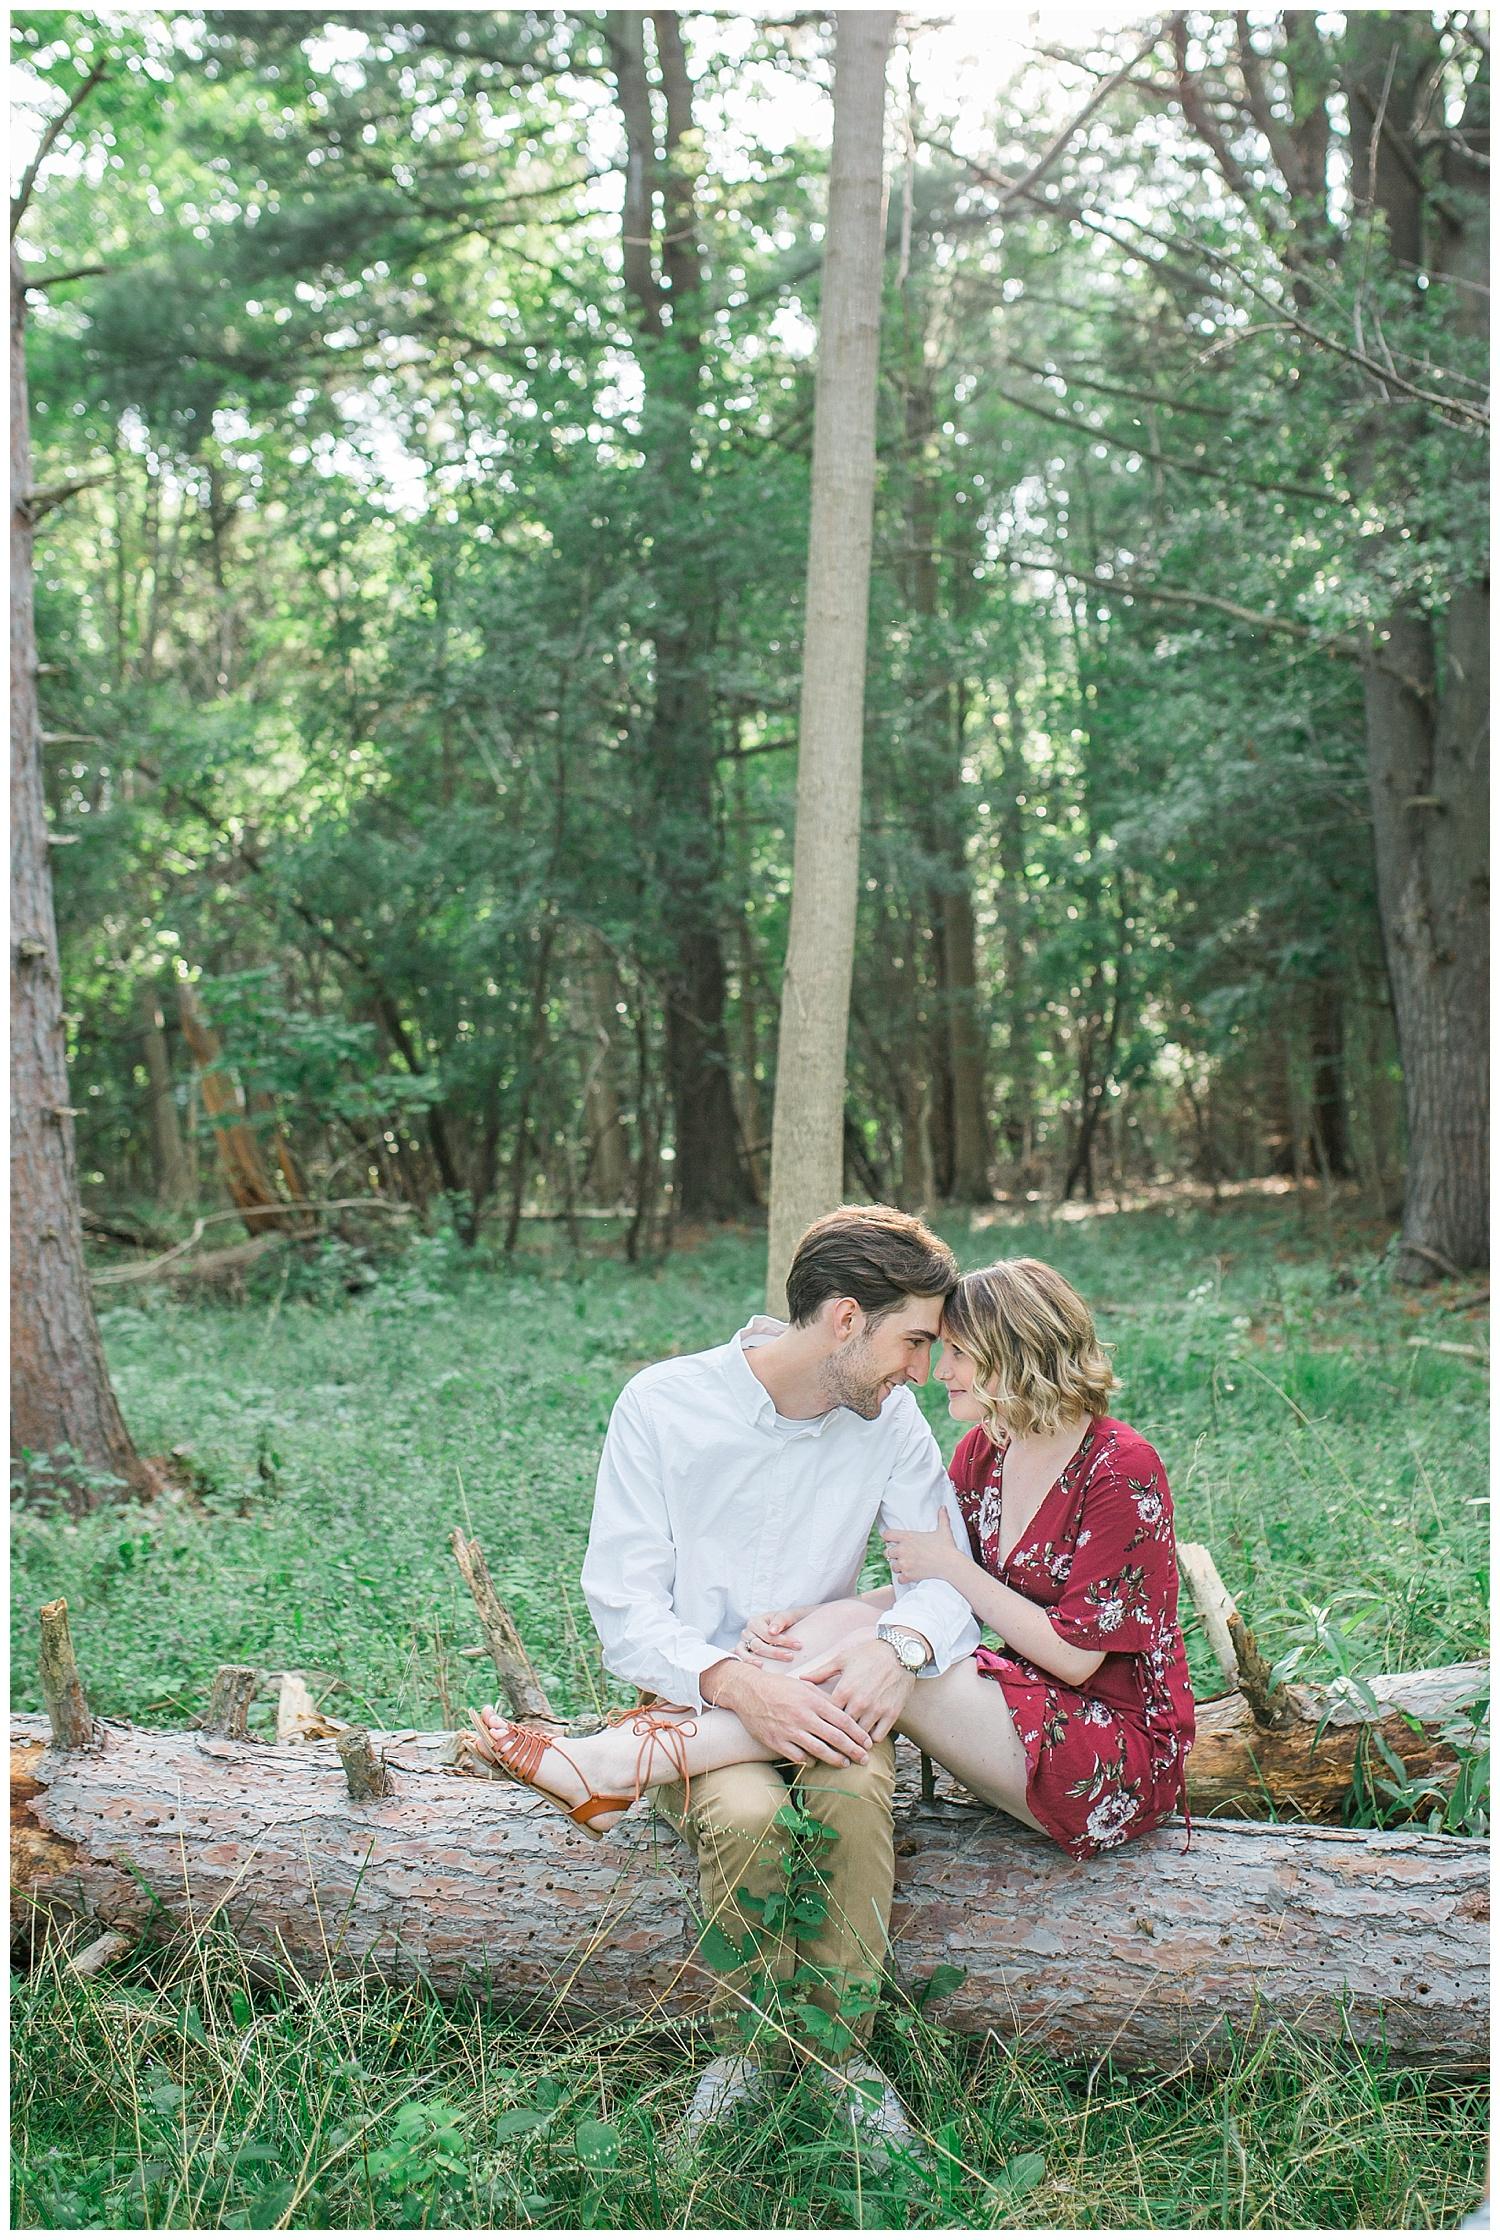 Tanya and Ryan - Sweetheart session - Lass & Beau - Geneseo NY-42_Buffalo wedding photography.jpg